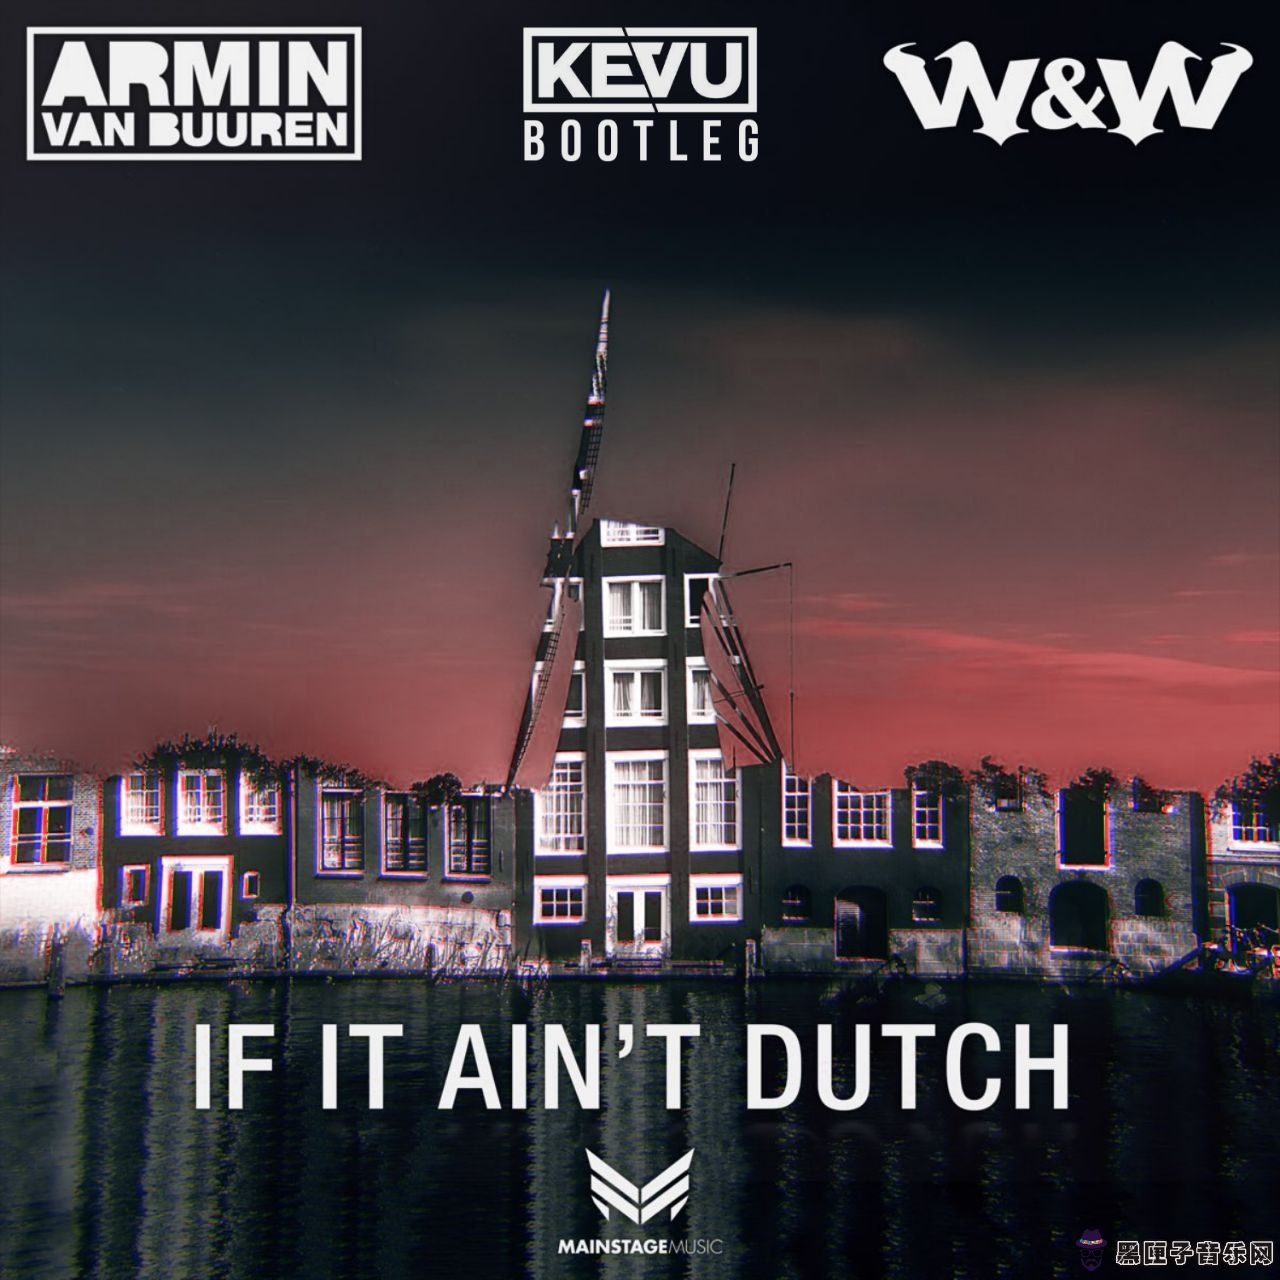 Armin Van Buuren x W&W - If It Aint Dutch (KEVU Bootleg)